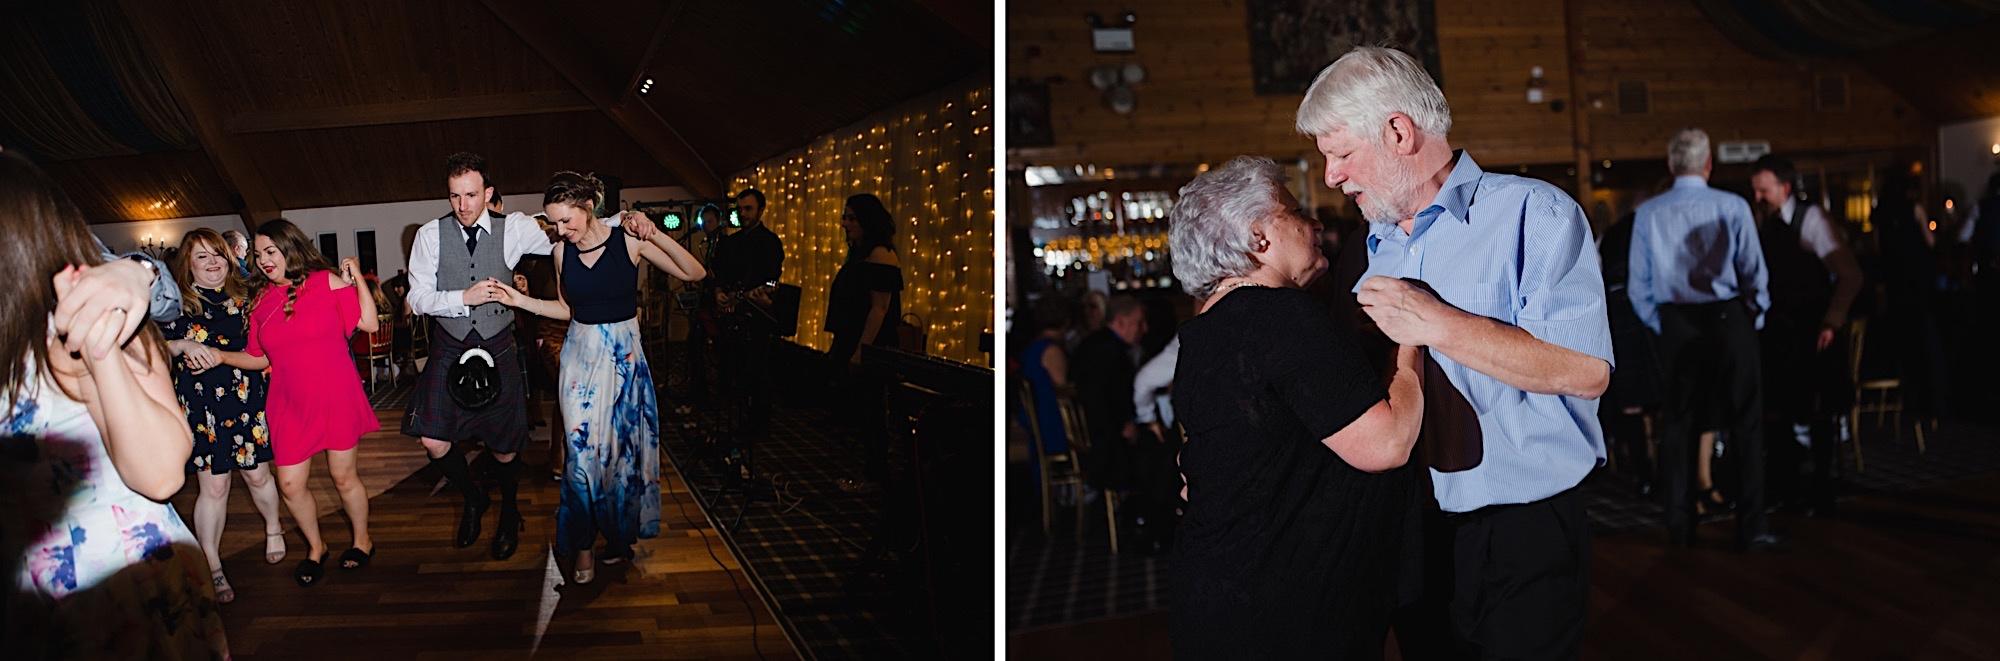 scottish ceilidh dancing at the cruin loch lomand wedding